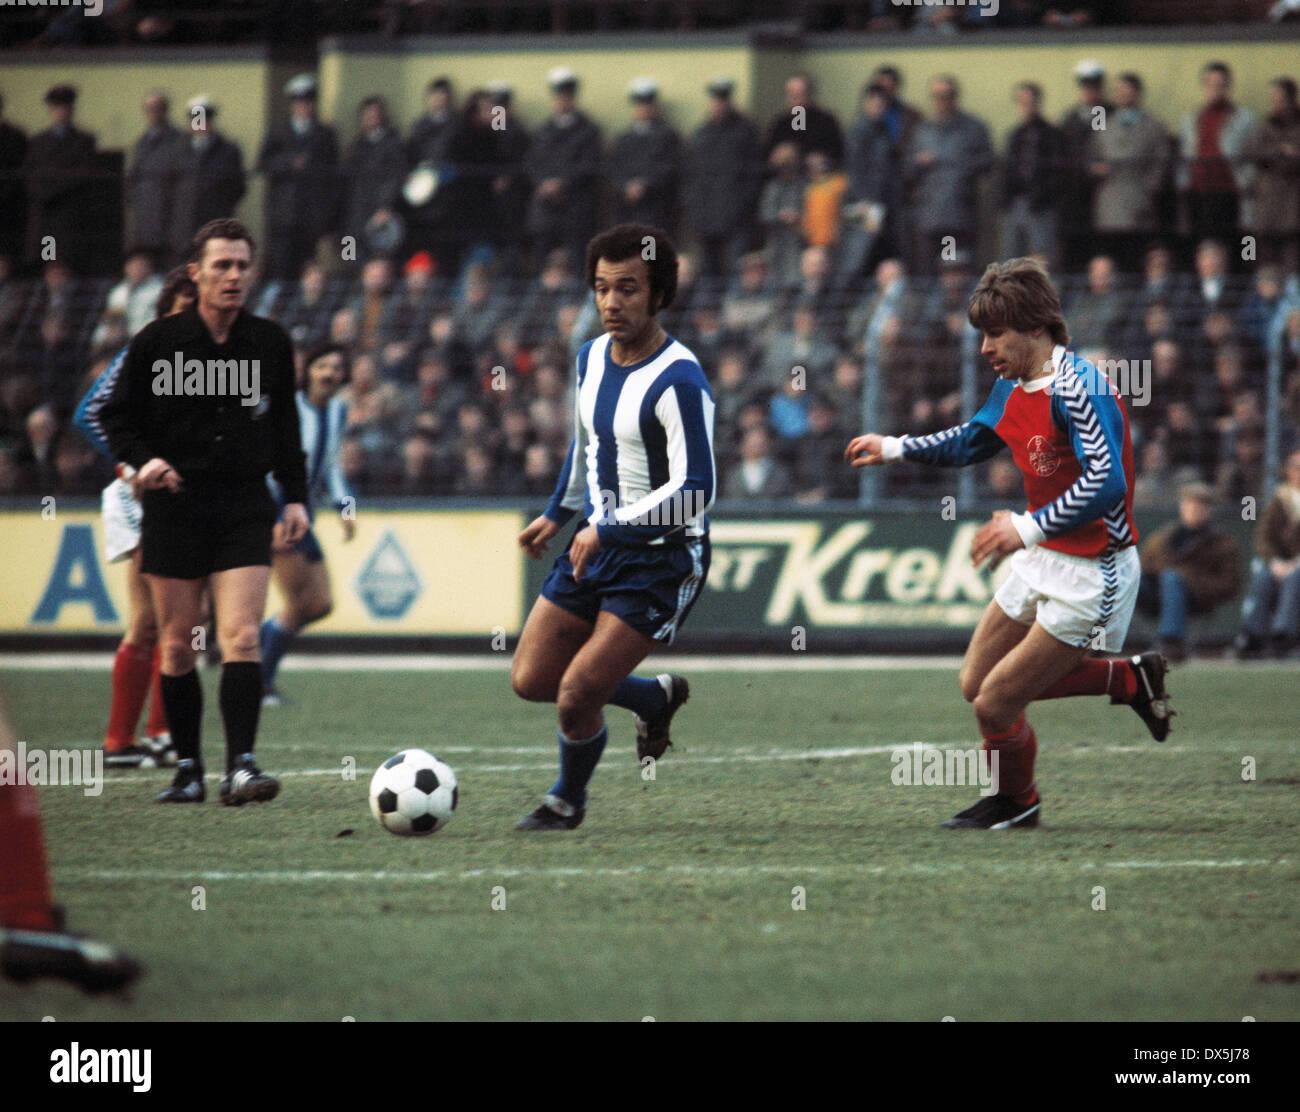 football, Bundesliga, 1975/1976, Grotenburg Stadium, FC Bayer 05 Uerdingen versus Hertha BSC Berlin 1:1, scene of the match, f.l.t.r. referee Guenter Linn, Erwin Kostedde (Hertha), Norbert Brinkmann (05) - Stock Image